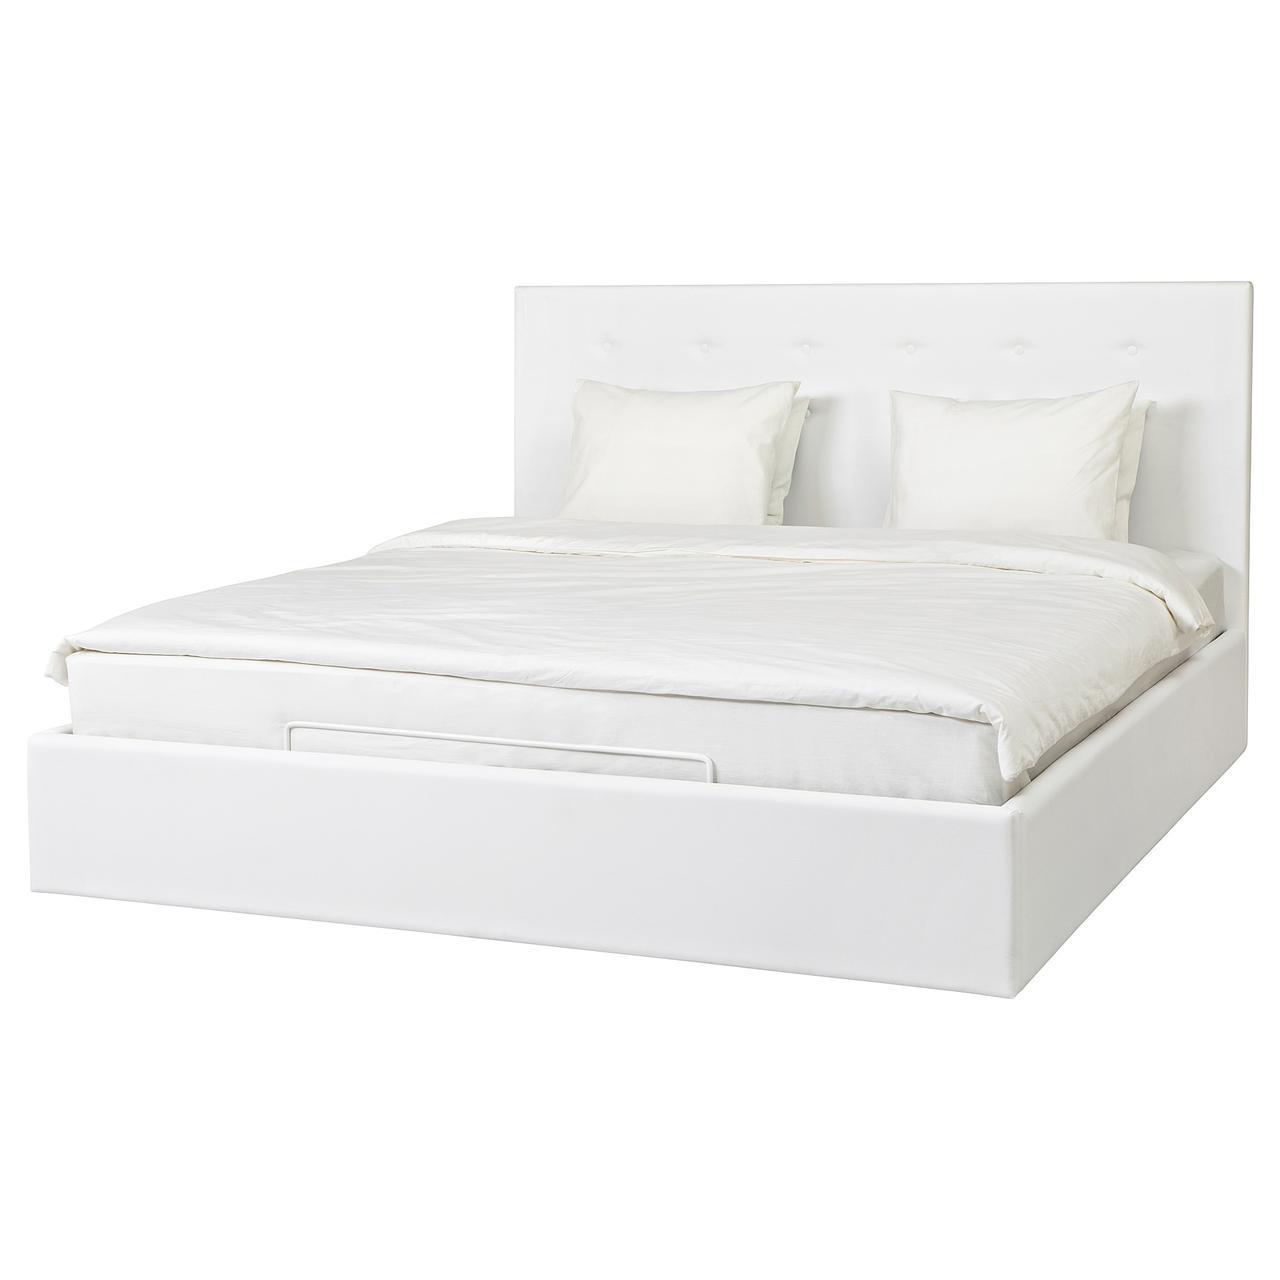 ✅ IKEA GVARV (604.097.22) Кровать с подъемным механизмом, Idhult white